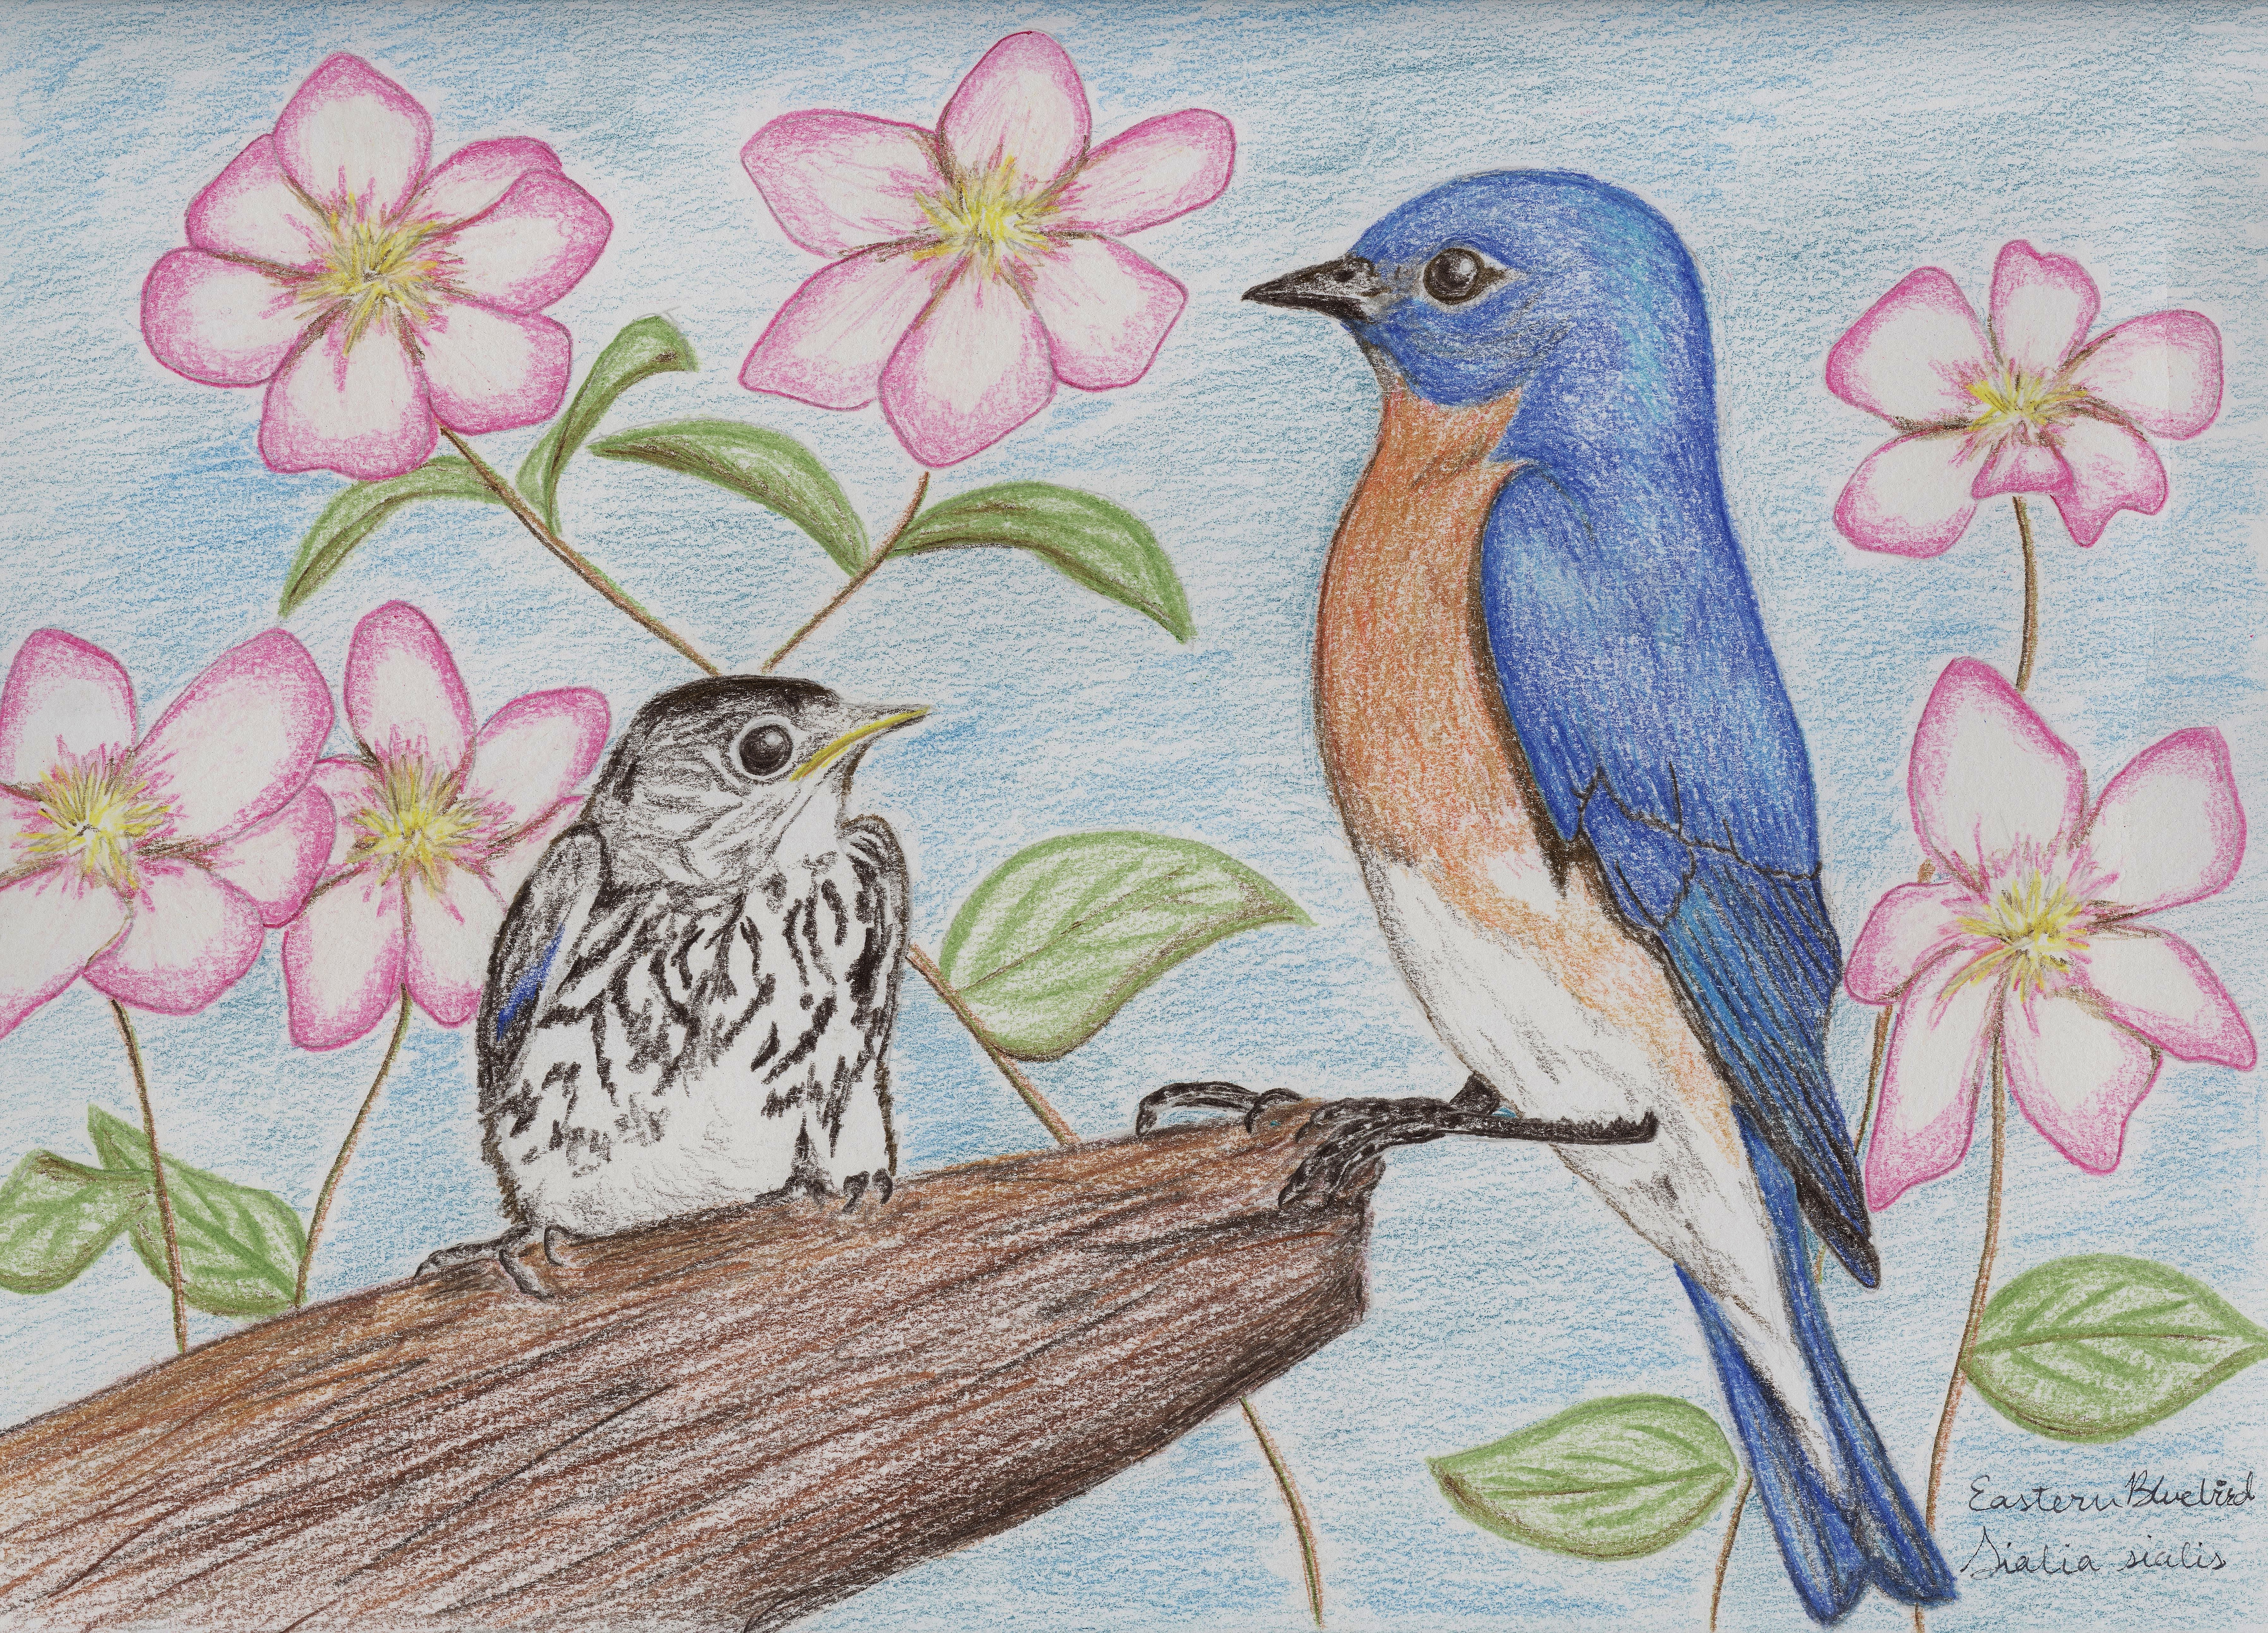 7148x5148 Eastern Bluebird Drawing (2) Standingoutinmyfield